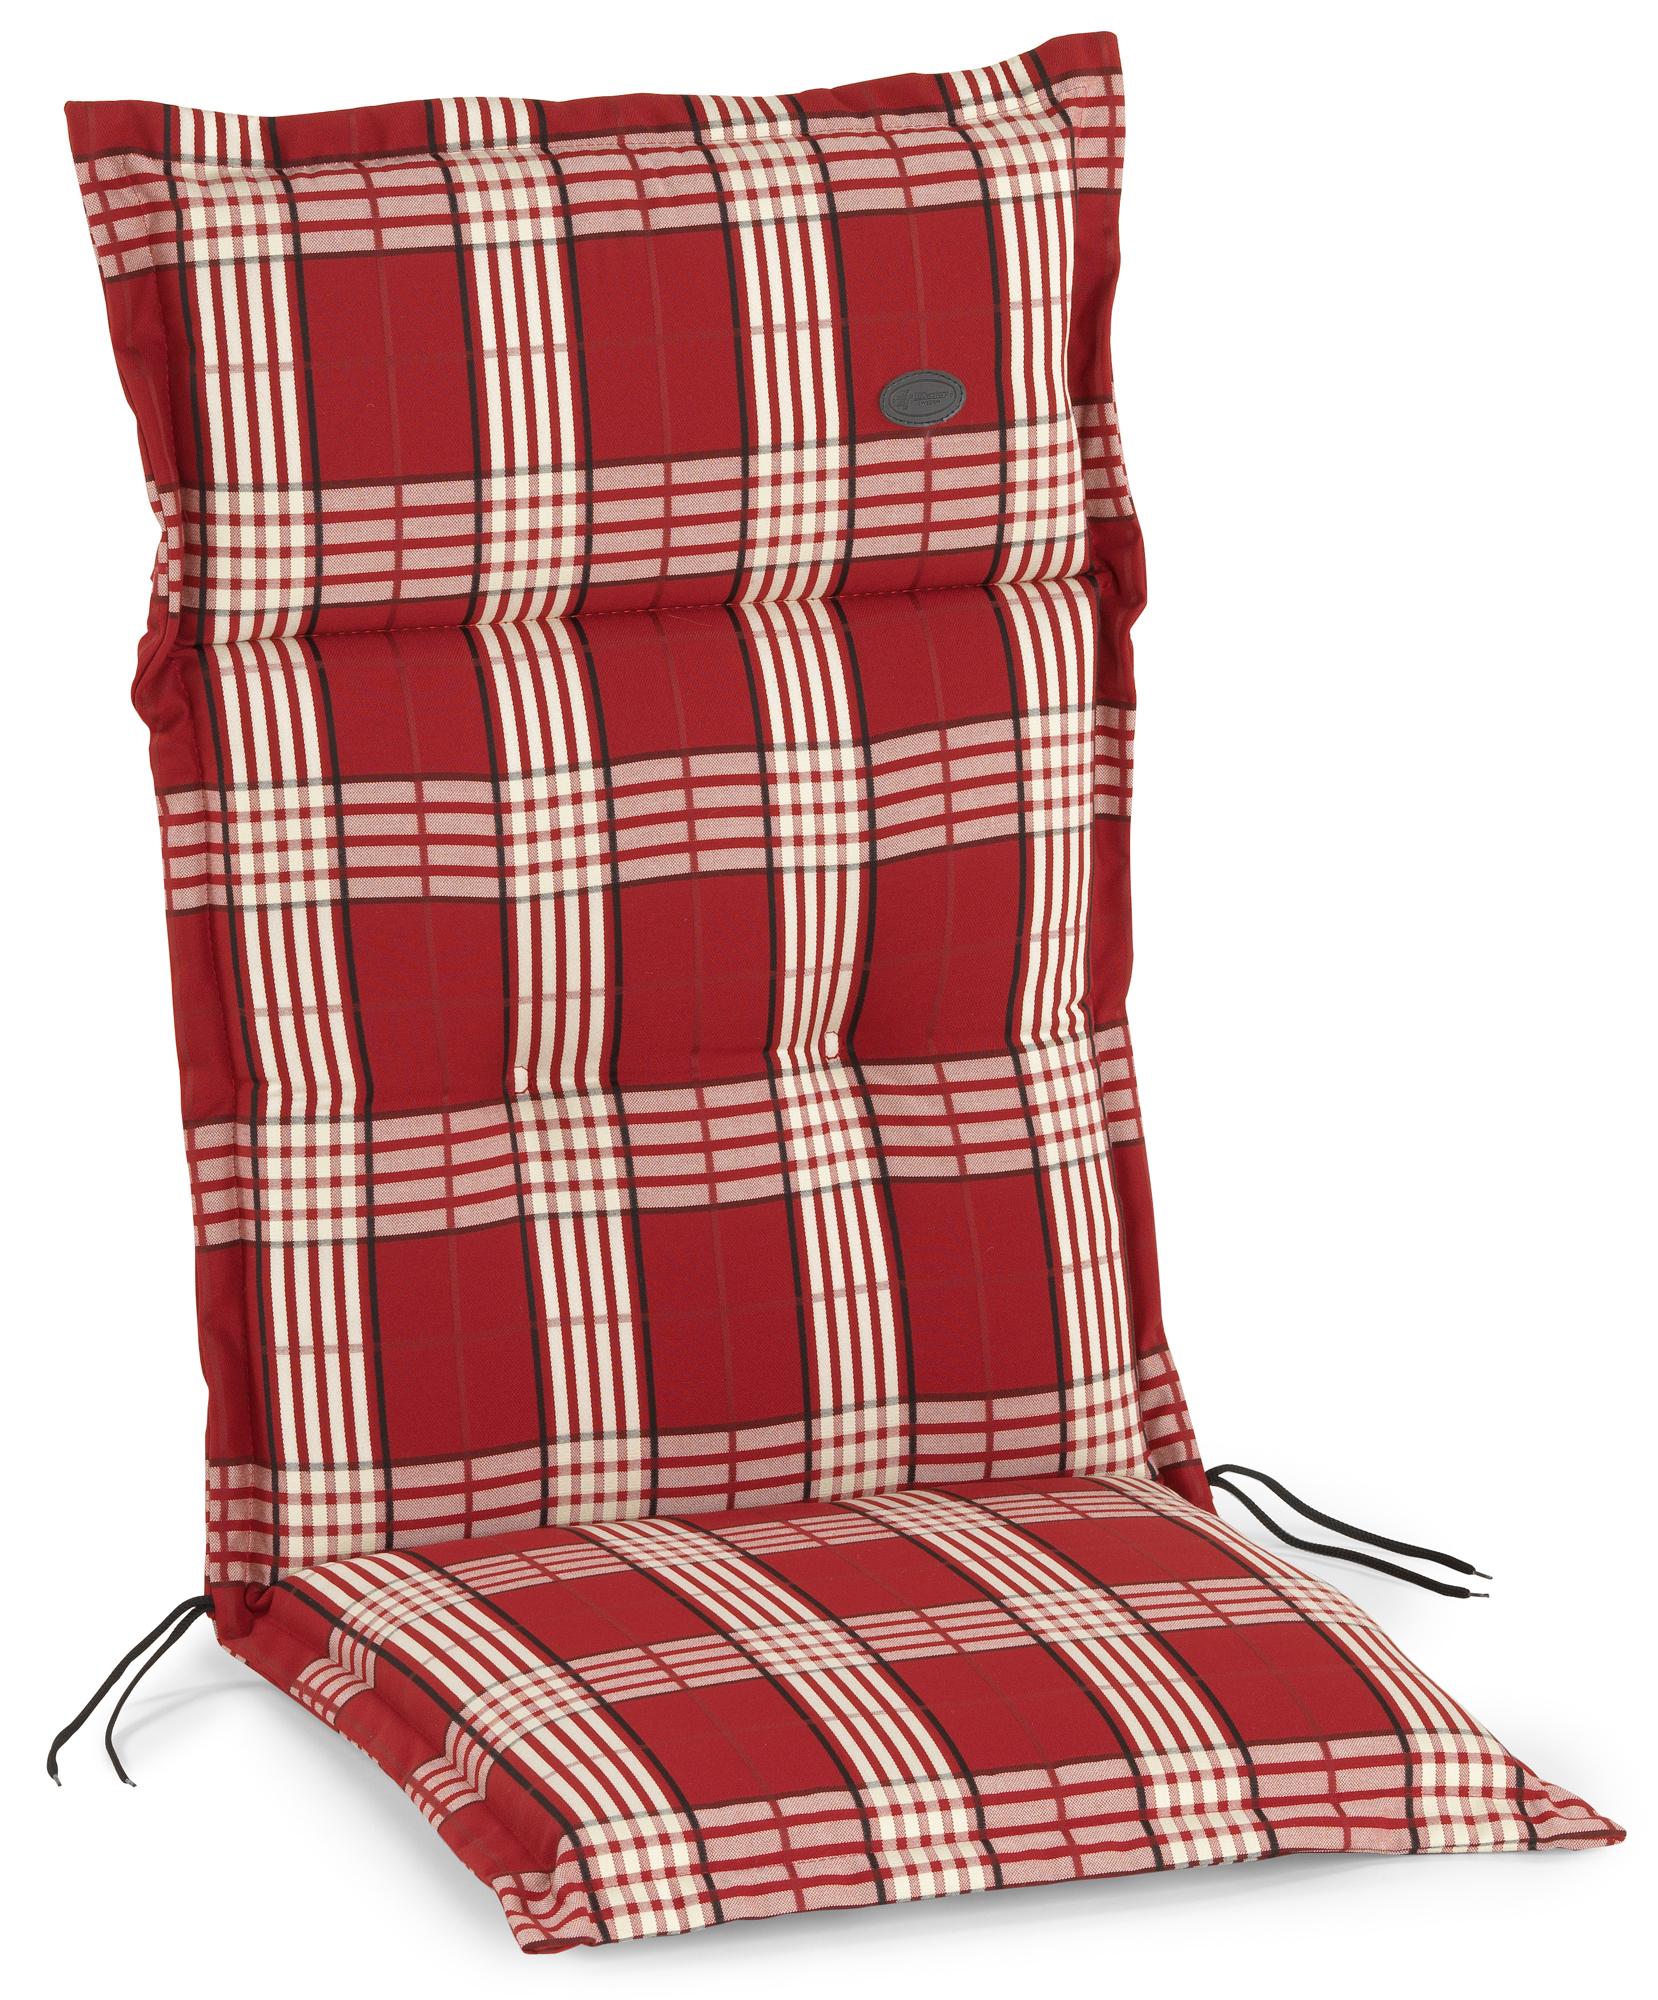 Milano dyna XL röd vit rutig 599 kr Trendrum se